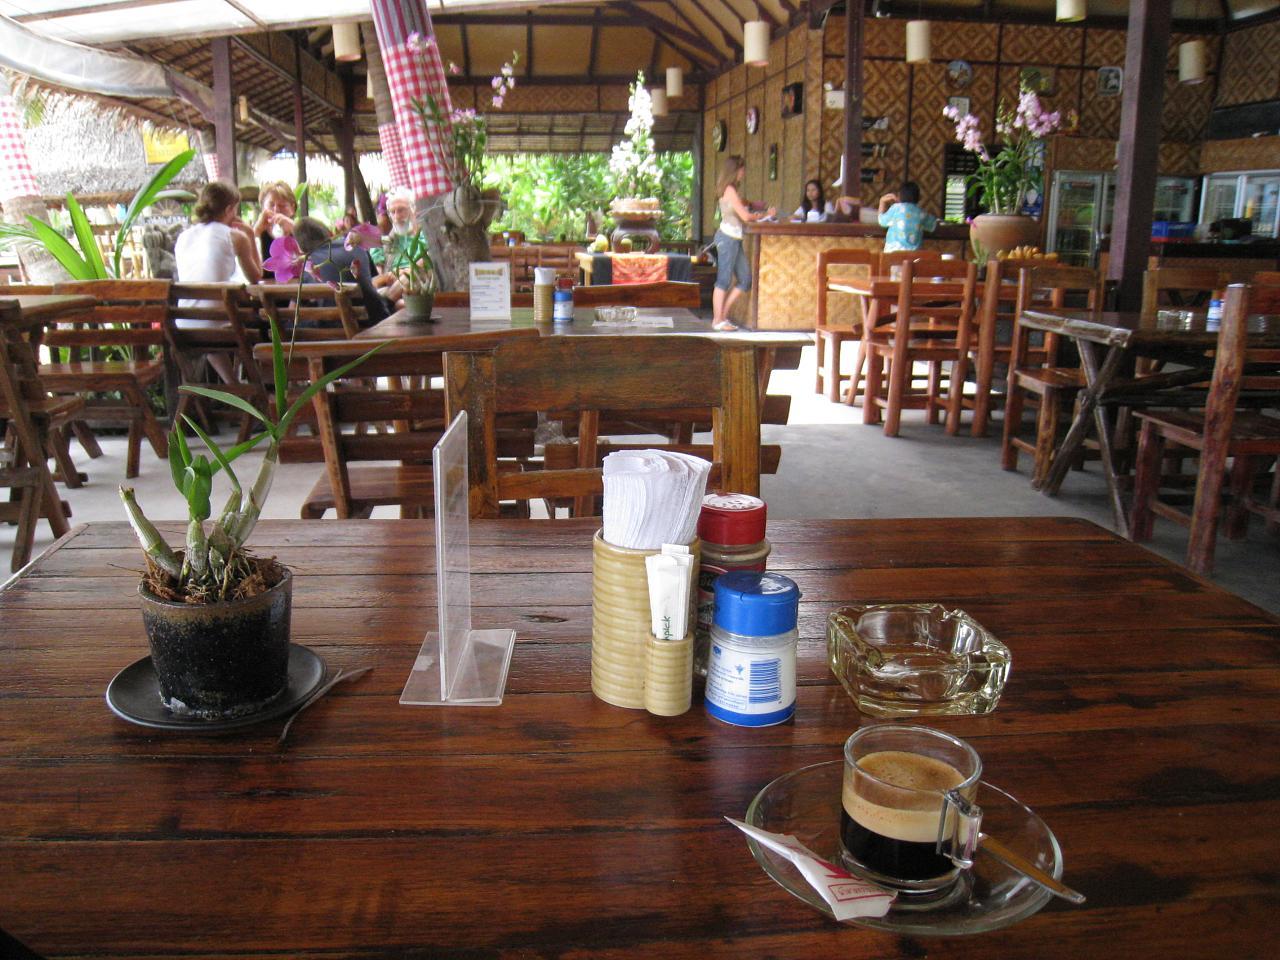 Bungalow restaurant - Thong Nai Pan Noi (beach), Koh Phangan, Thailand